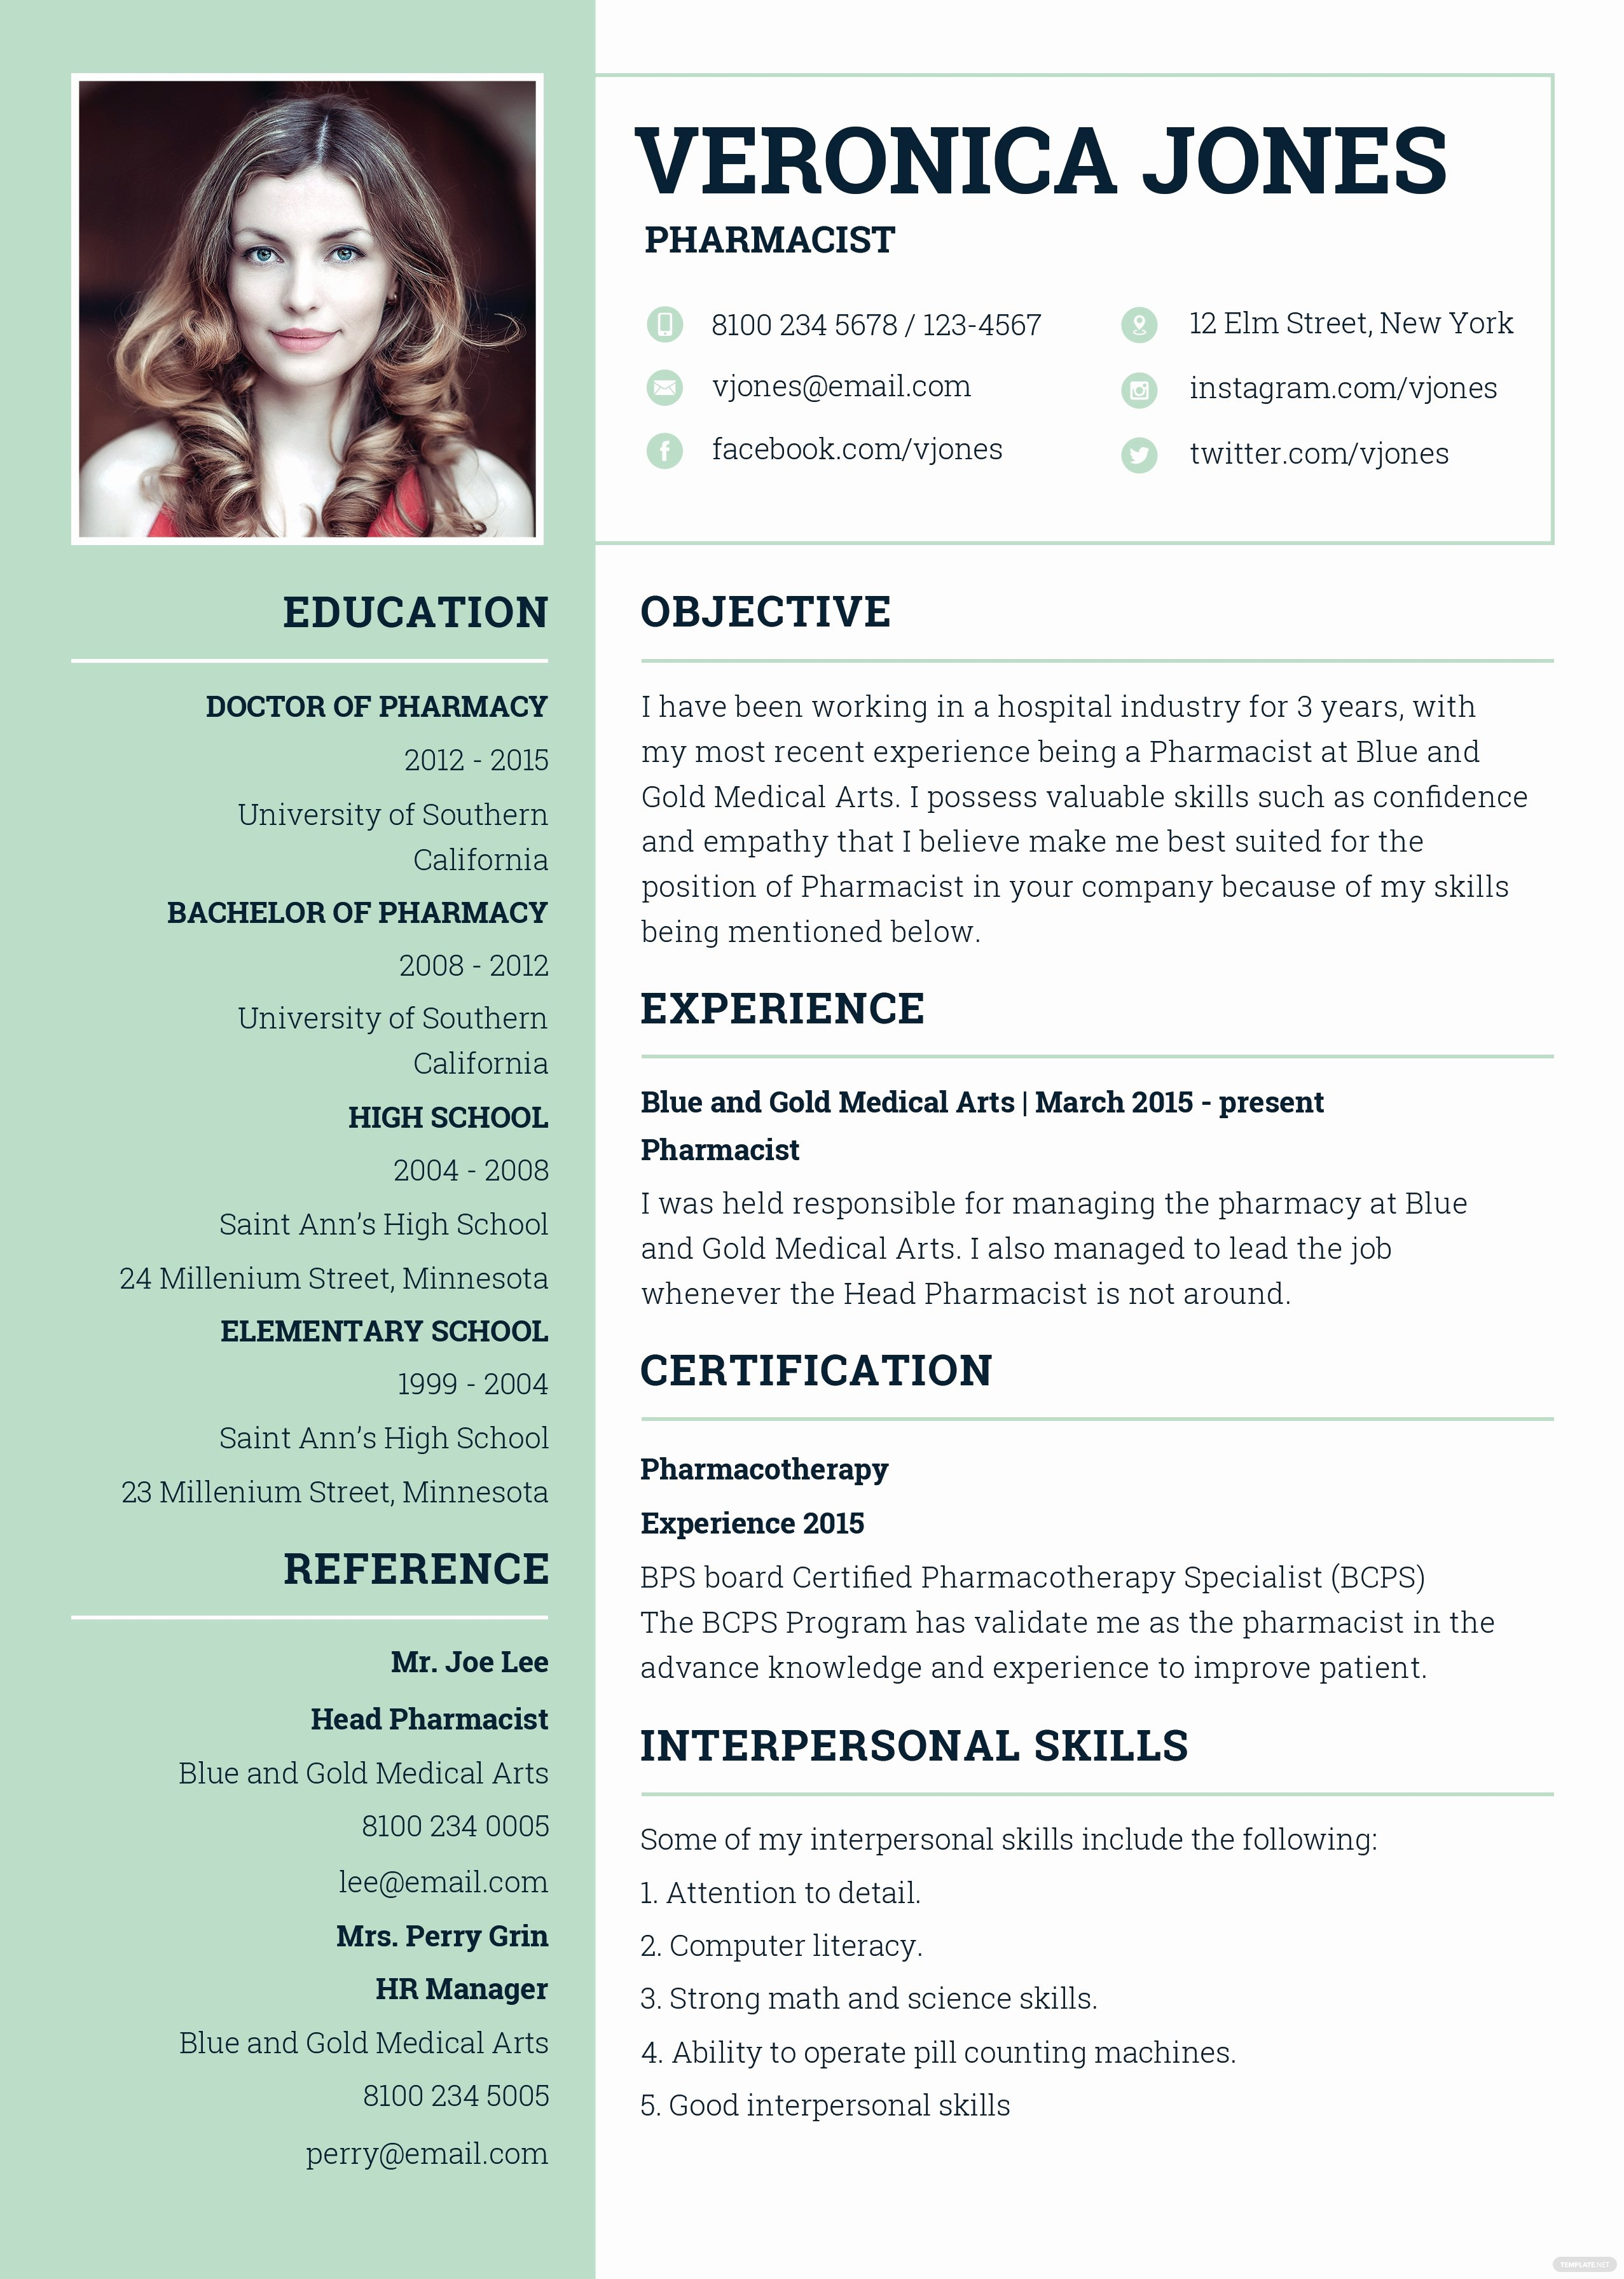 Pharmacist Resume Templates Beautiful Free Basic Pharmacist Resume and Cv Template In Adobe